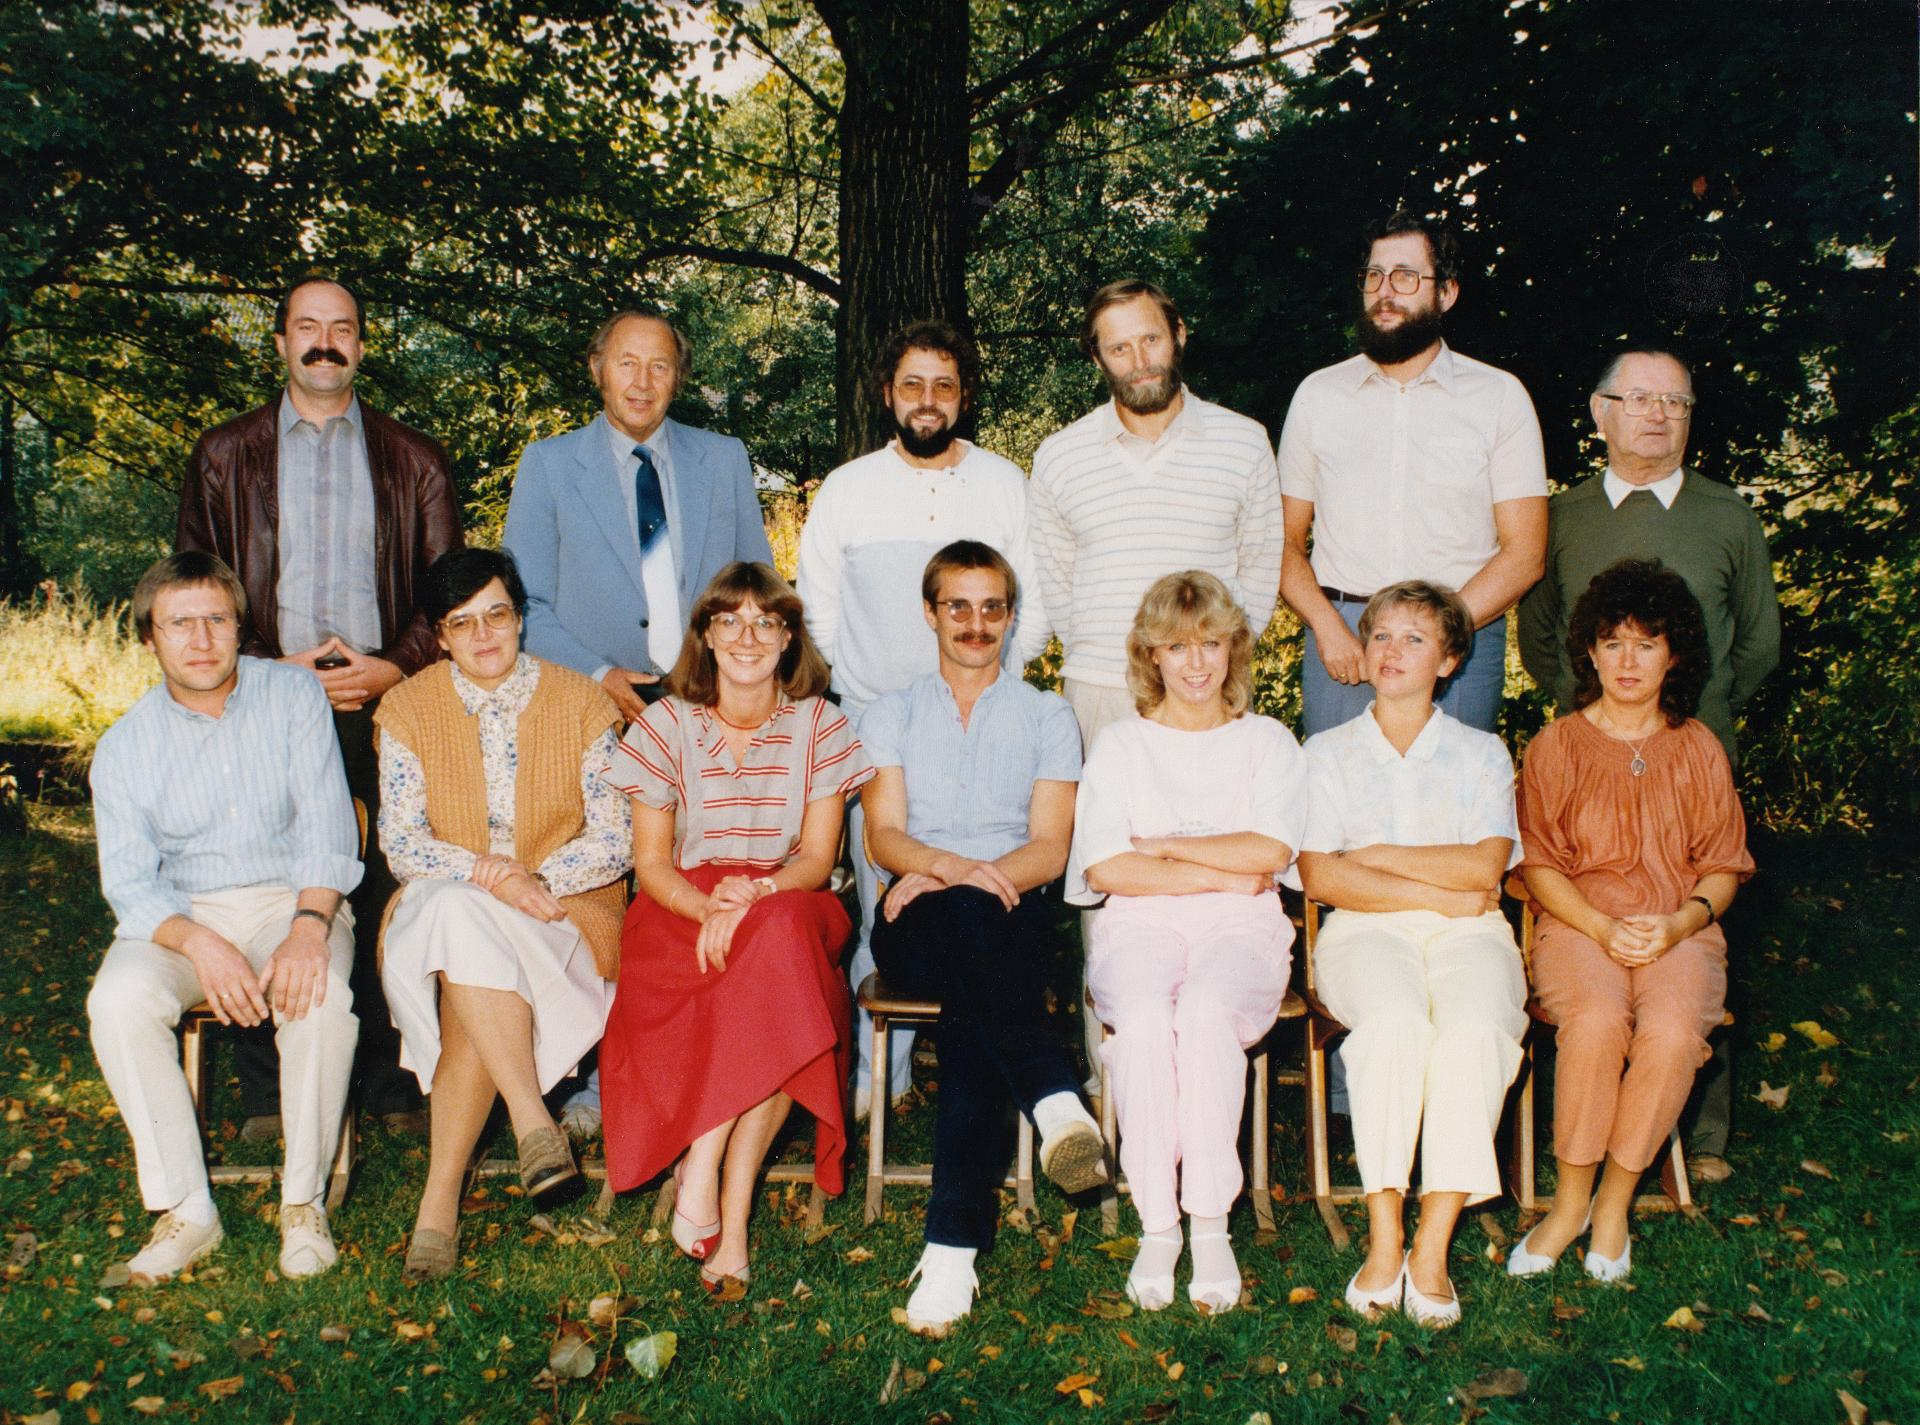 Tröstau Kollegium 1985 Herbst